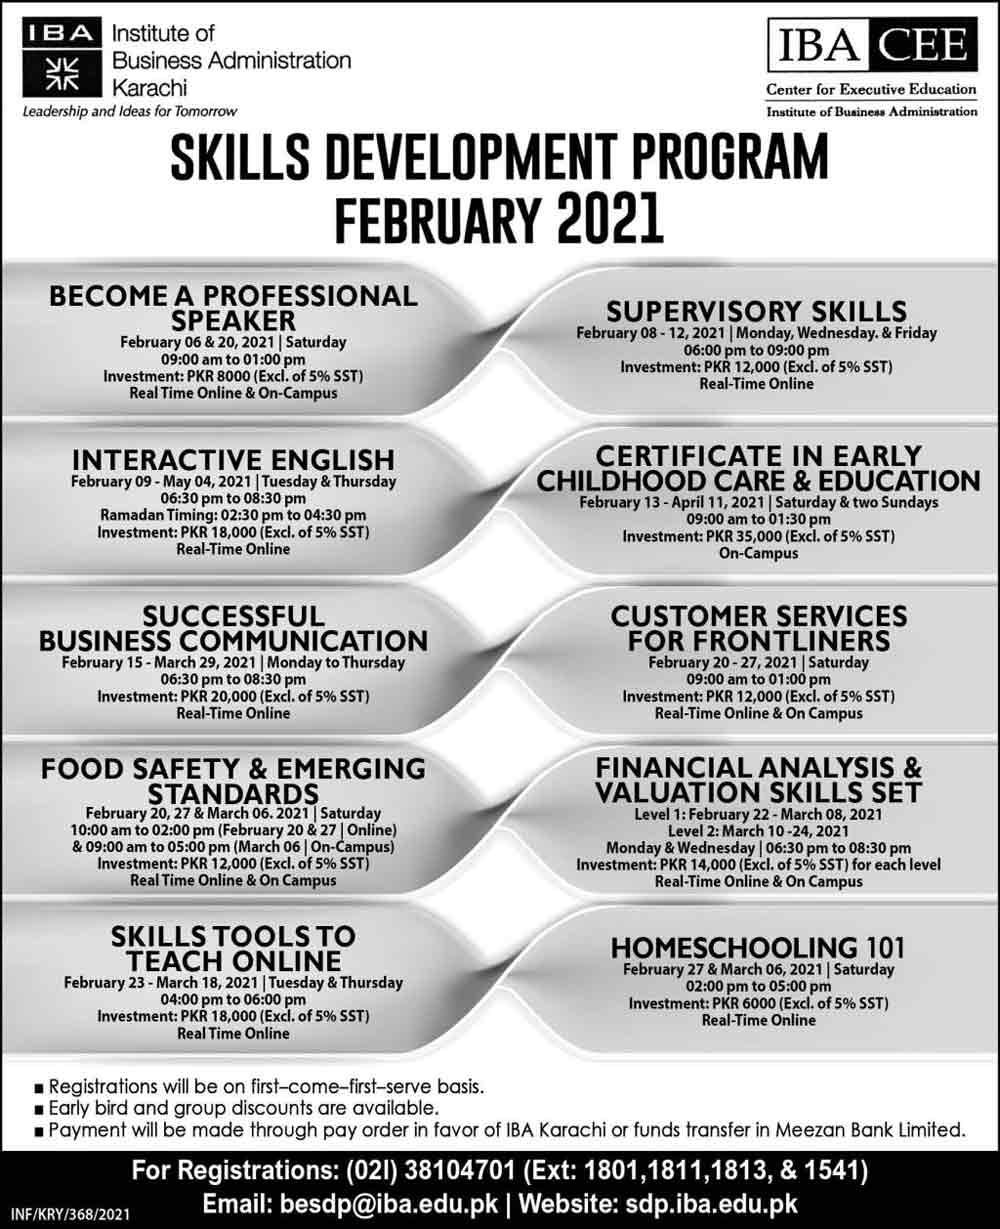 Skill-Development-Program-2021-IBA